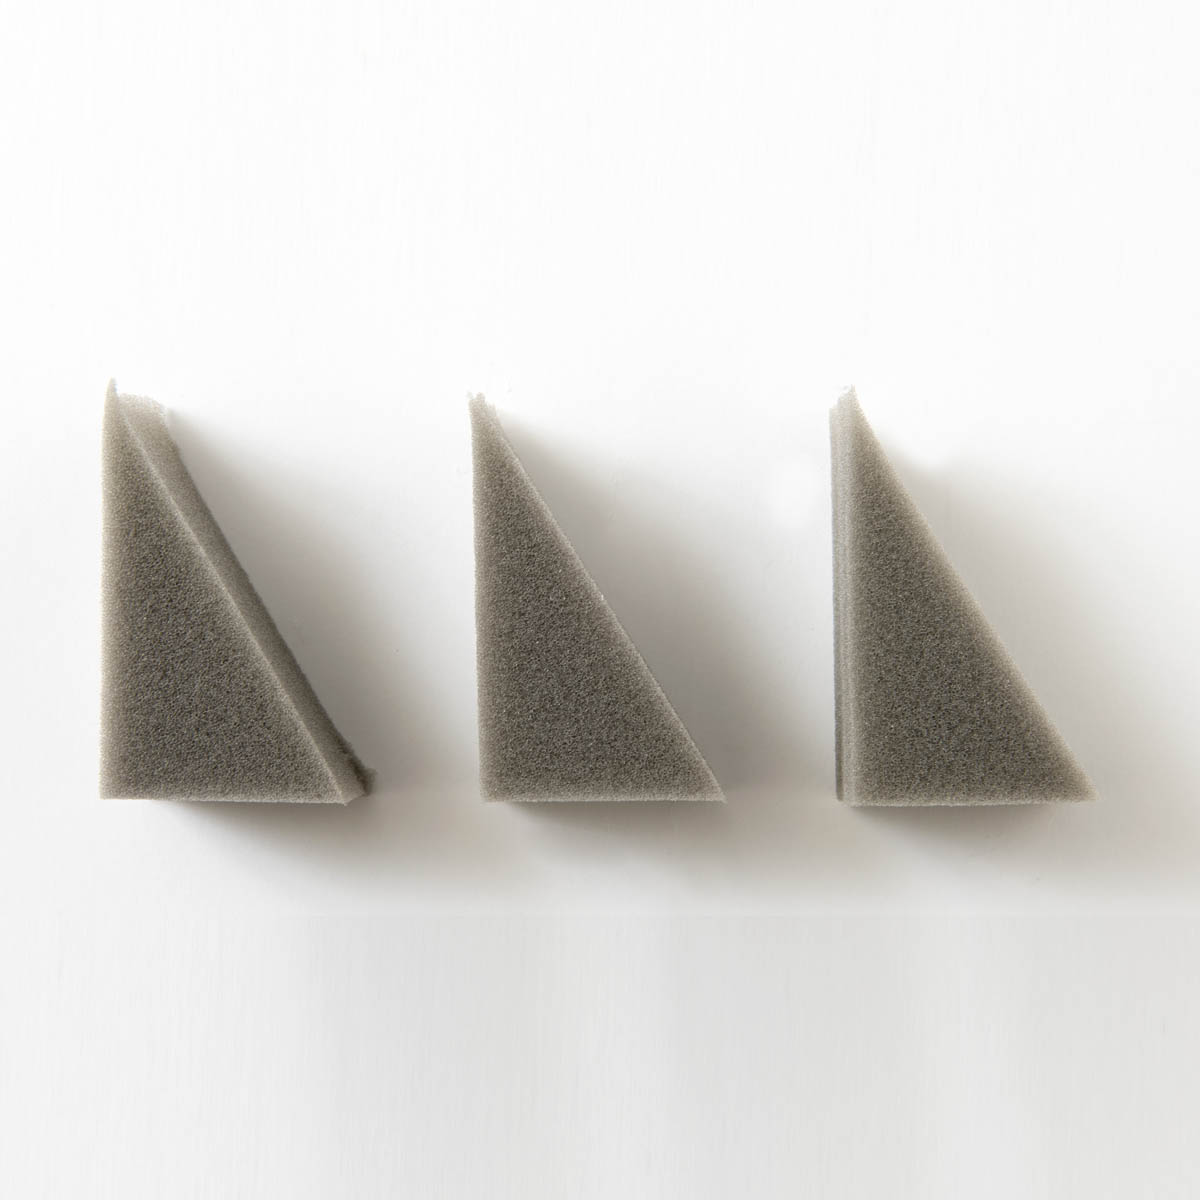 Waverly ® Inspirations Tools - Sponge Applicators, 3 pc. - 60743E